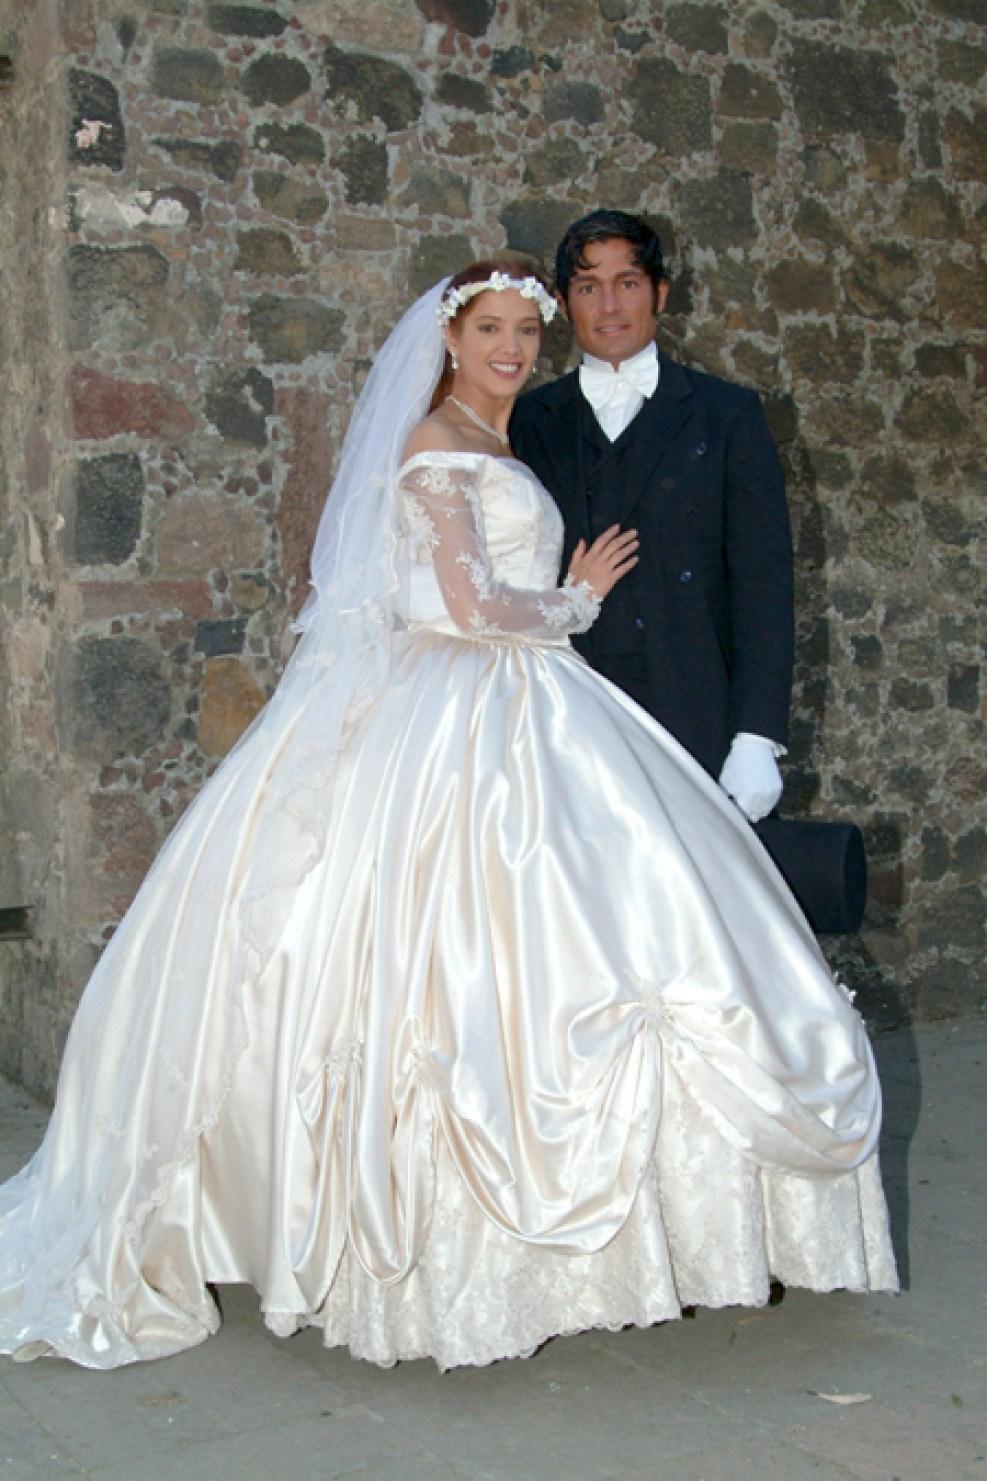 https://media.telemundochicago.com/images/987*1481/fernando-colunga-mezcalent-03.jpg